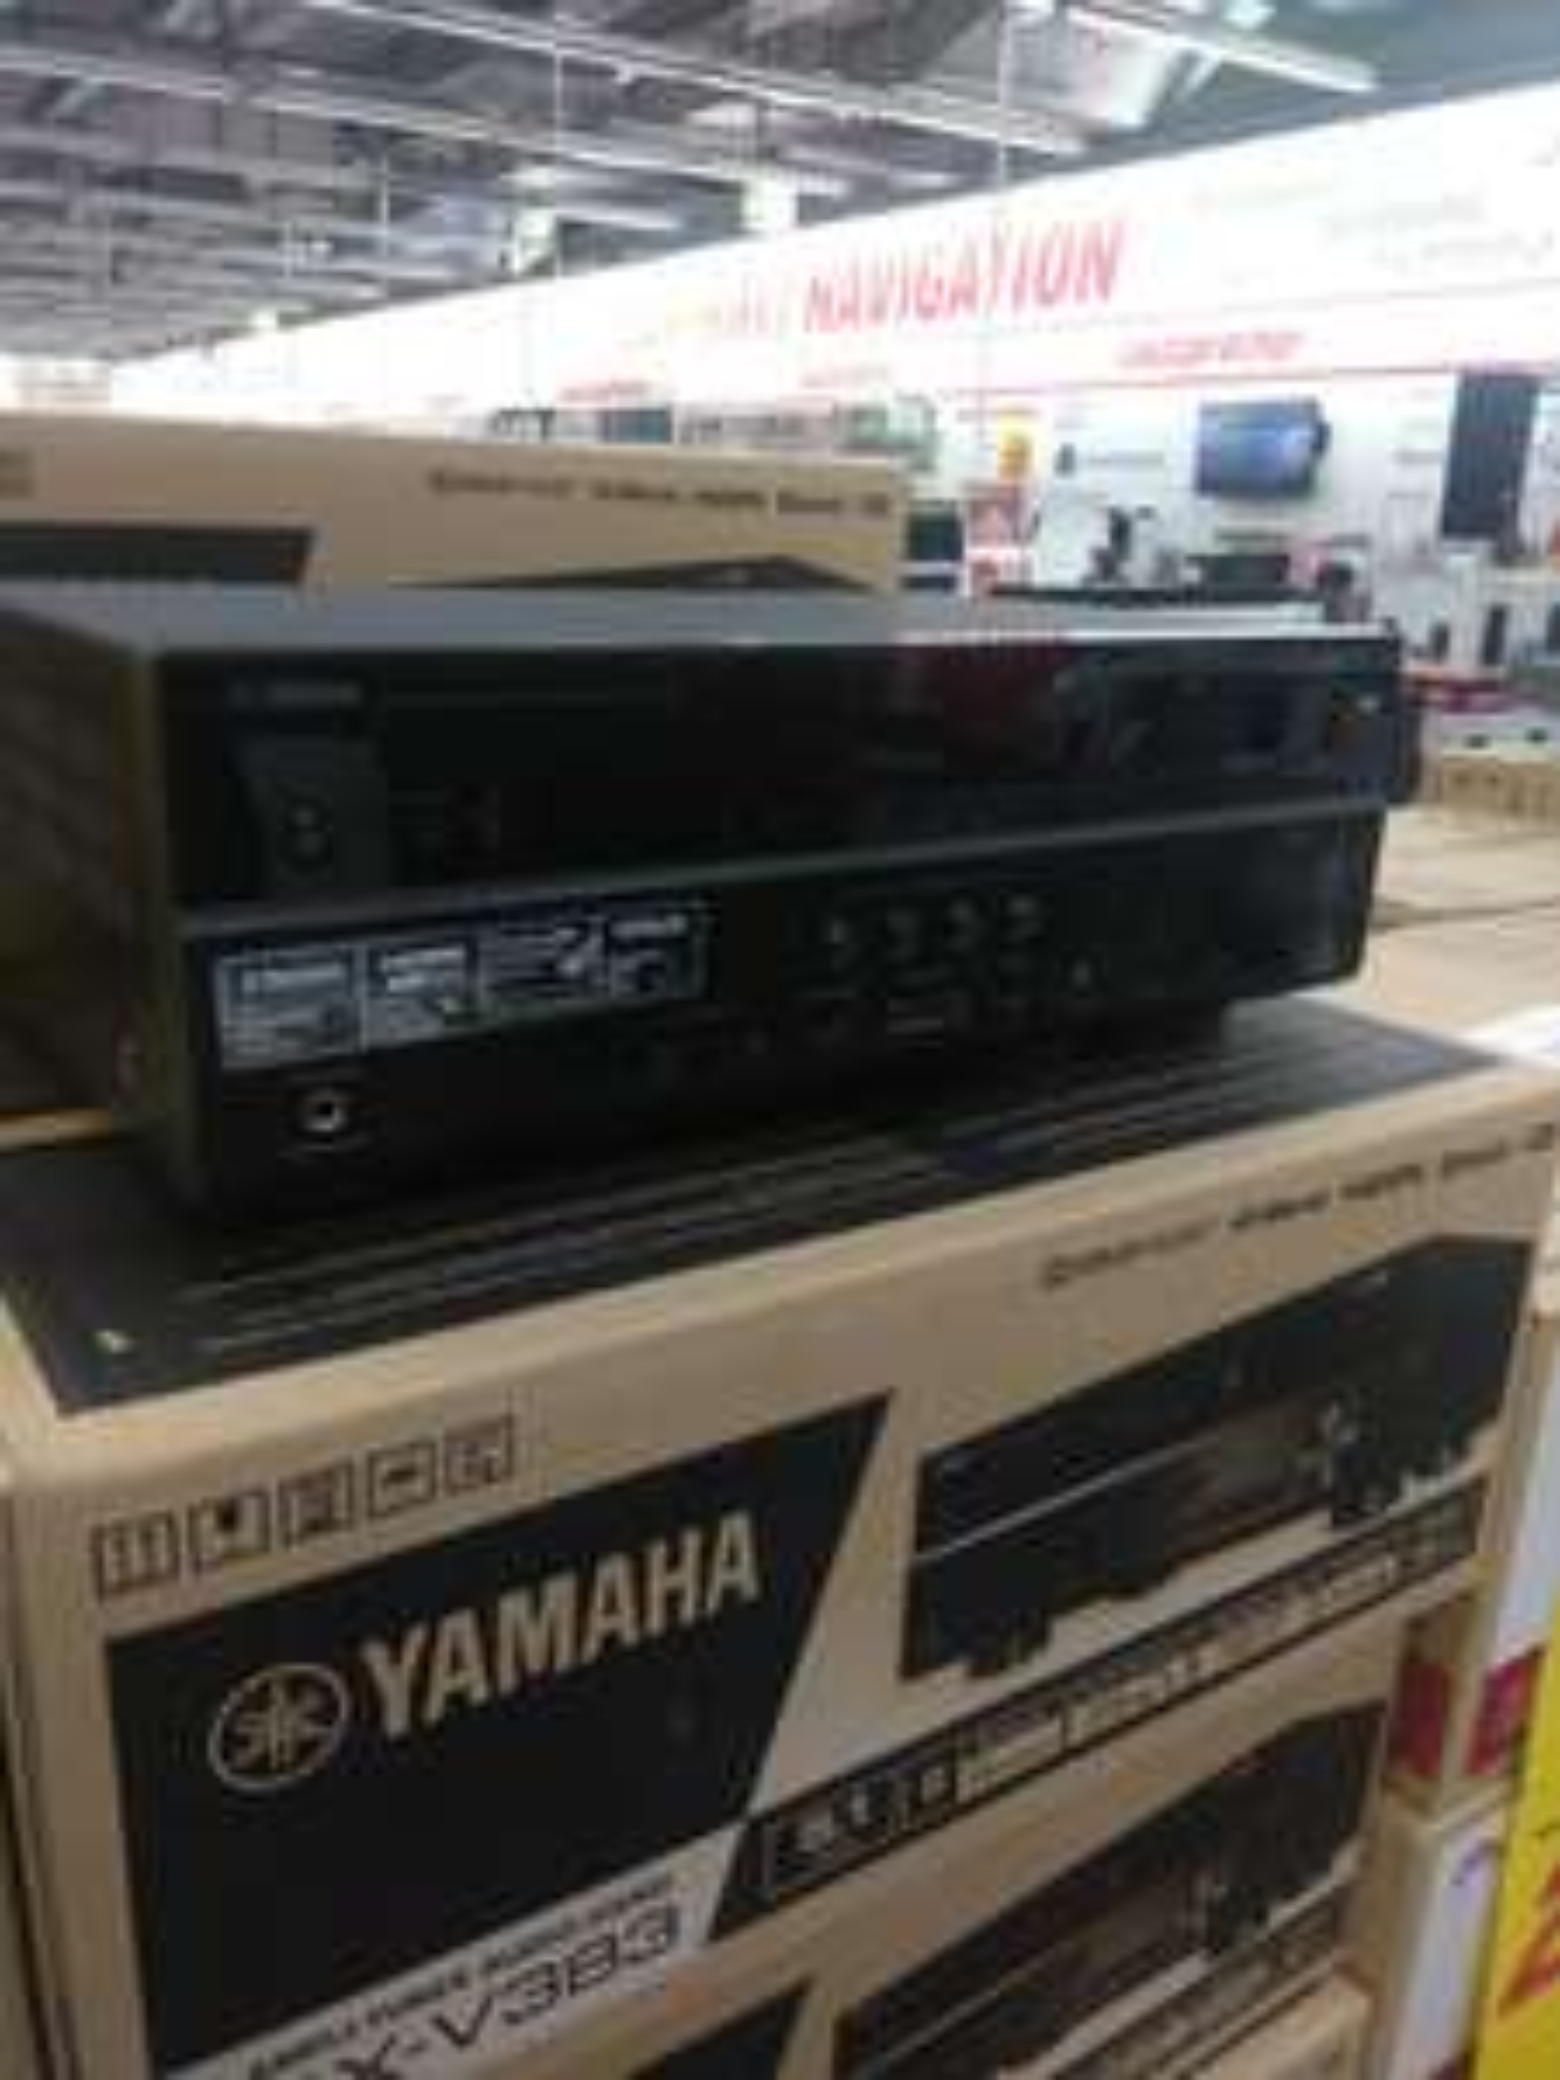 (lokaler Deal) Yamaha RX-V 383 Heimkinoreceiver Media Markt Bochum Ruhrpark